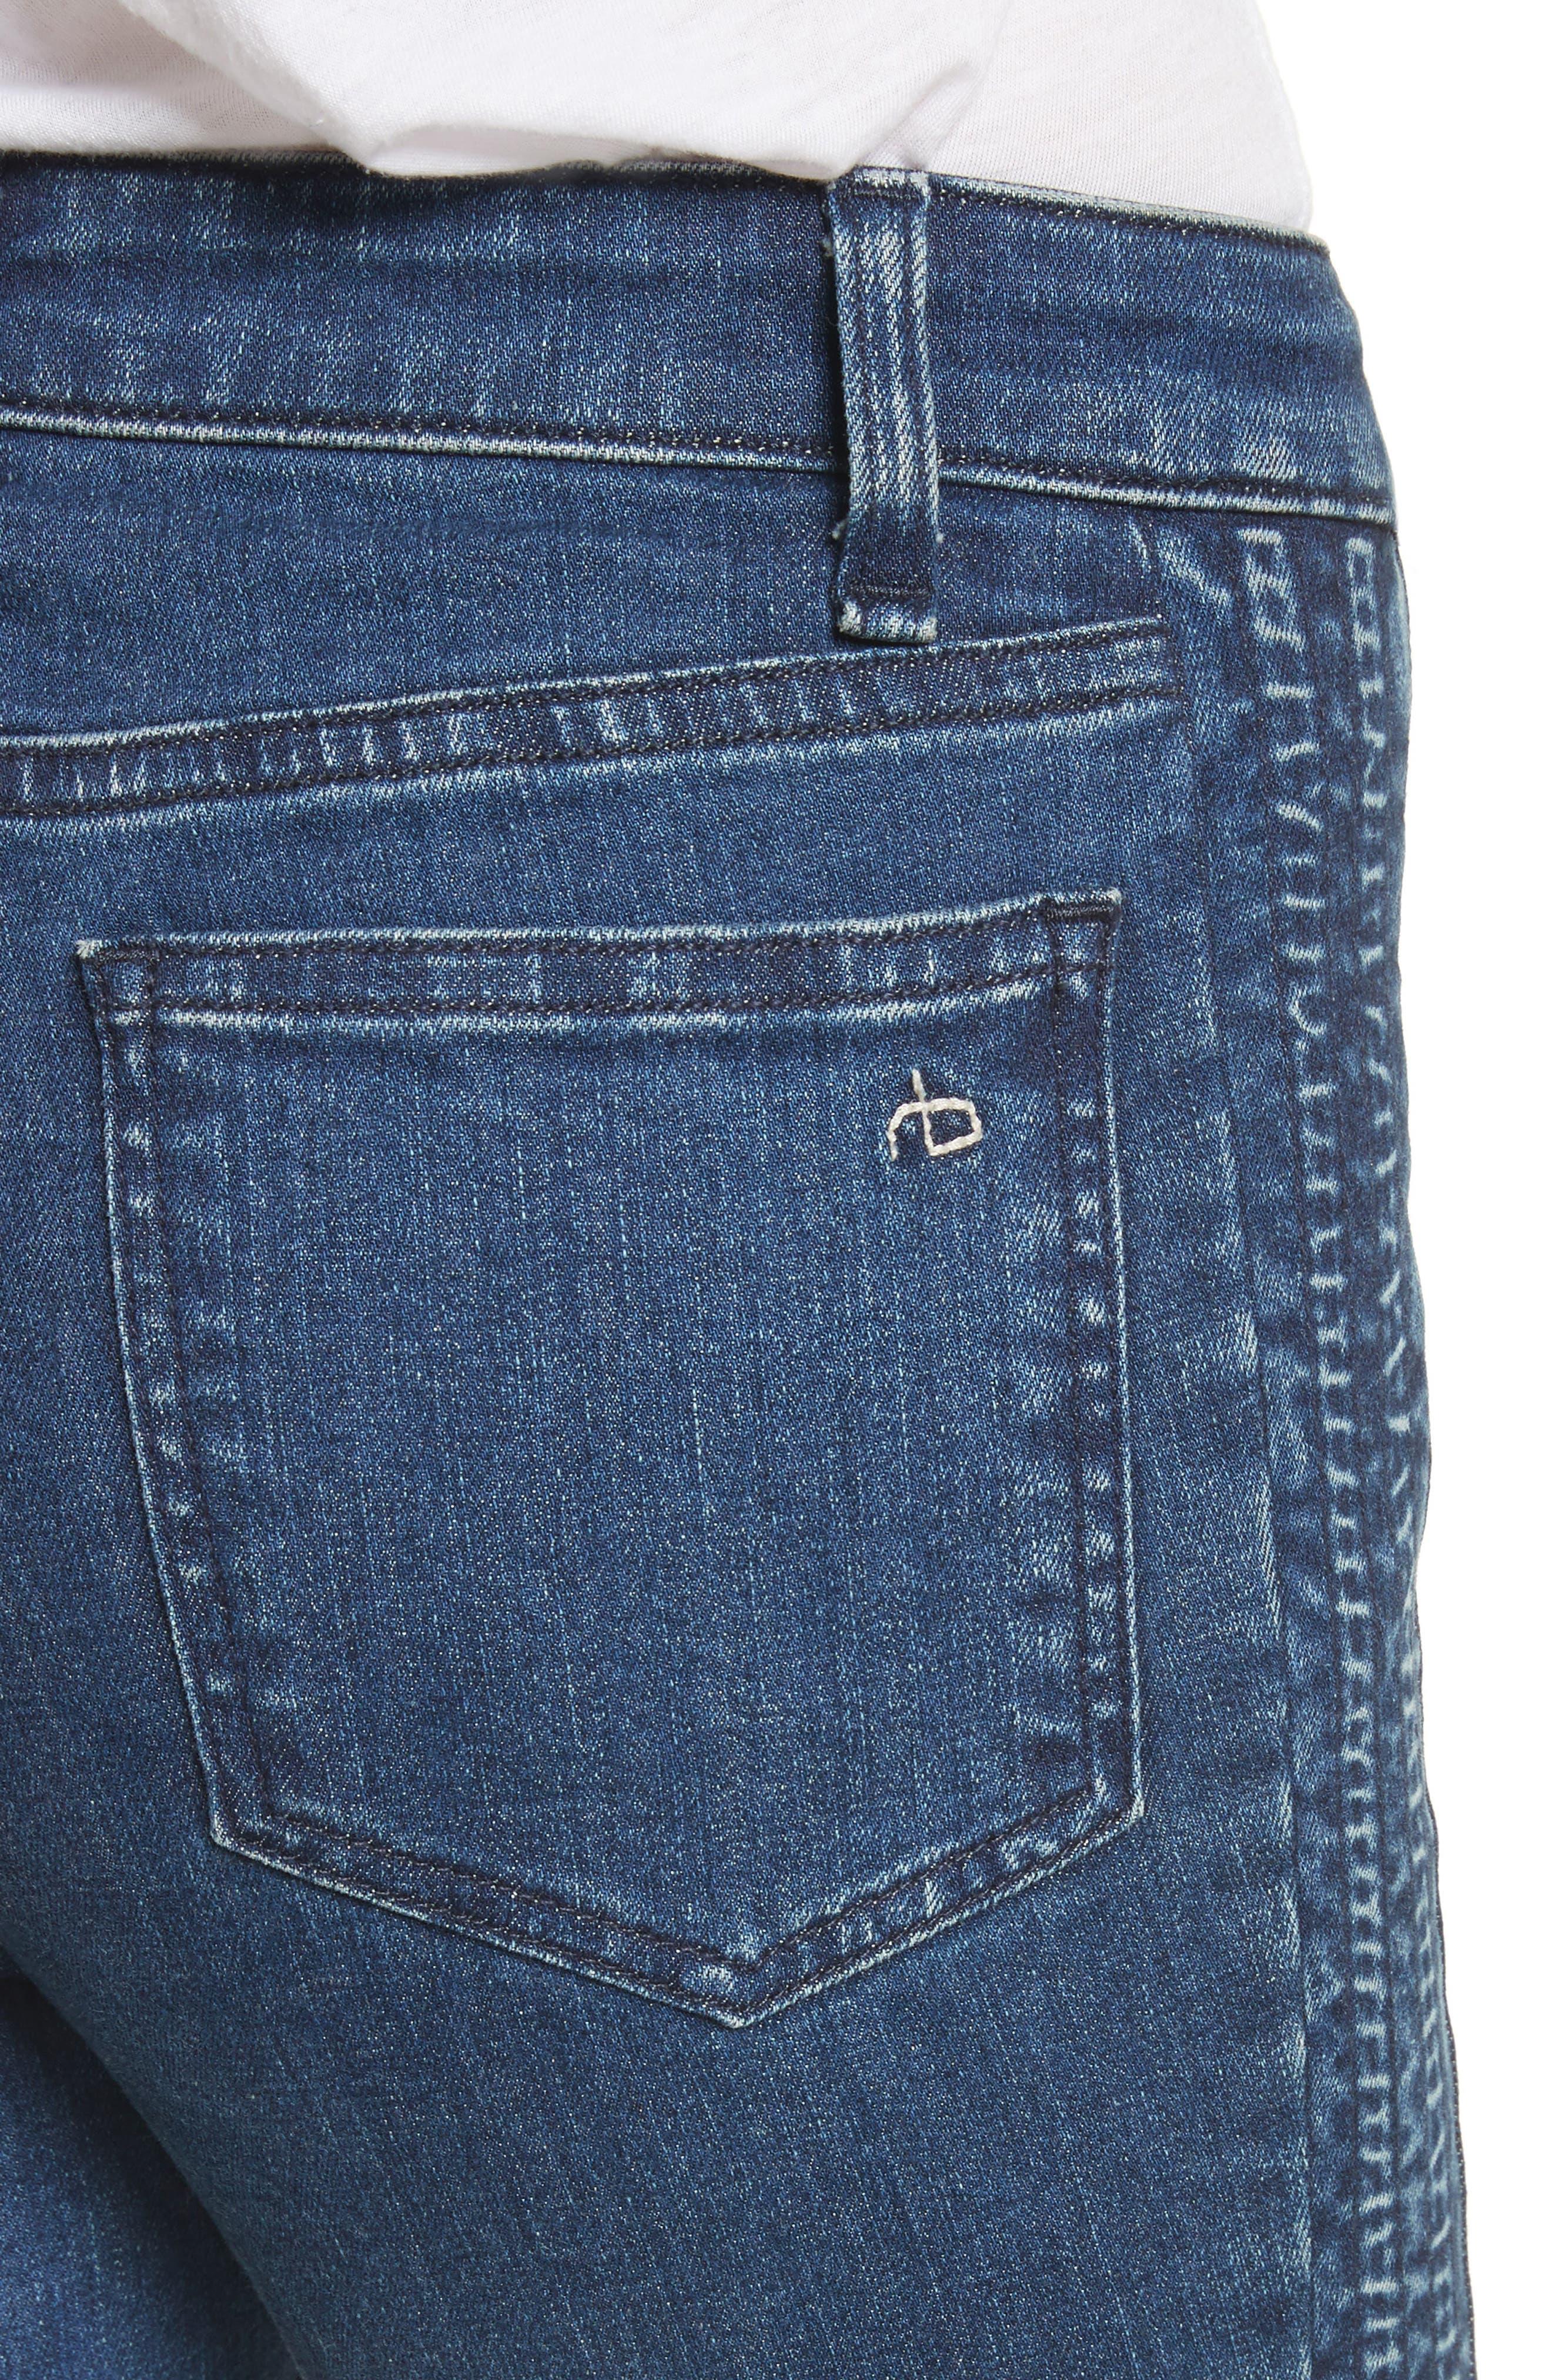 Ranata Tuxedo Cigarette Jeans,                             Alternate thumbnail 4, color,